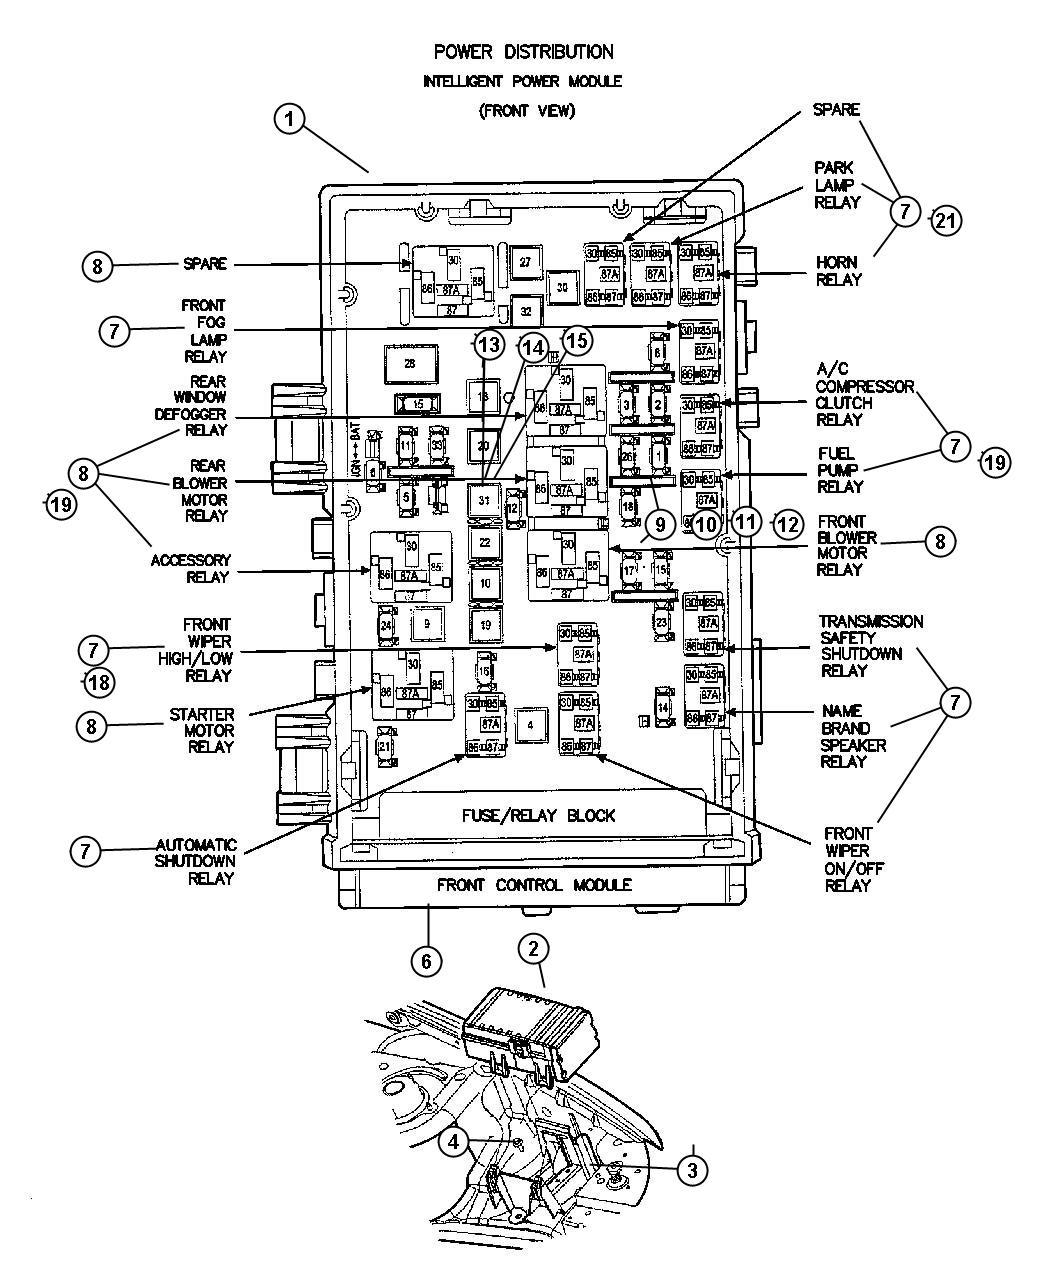 Fuse Box Diagram For 2001 Dodge Grand Caravan Schematics Wiring 1999 Junction 2005 Get Free Image 2004